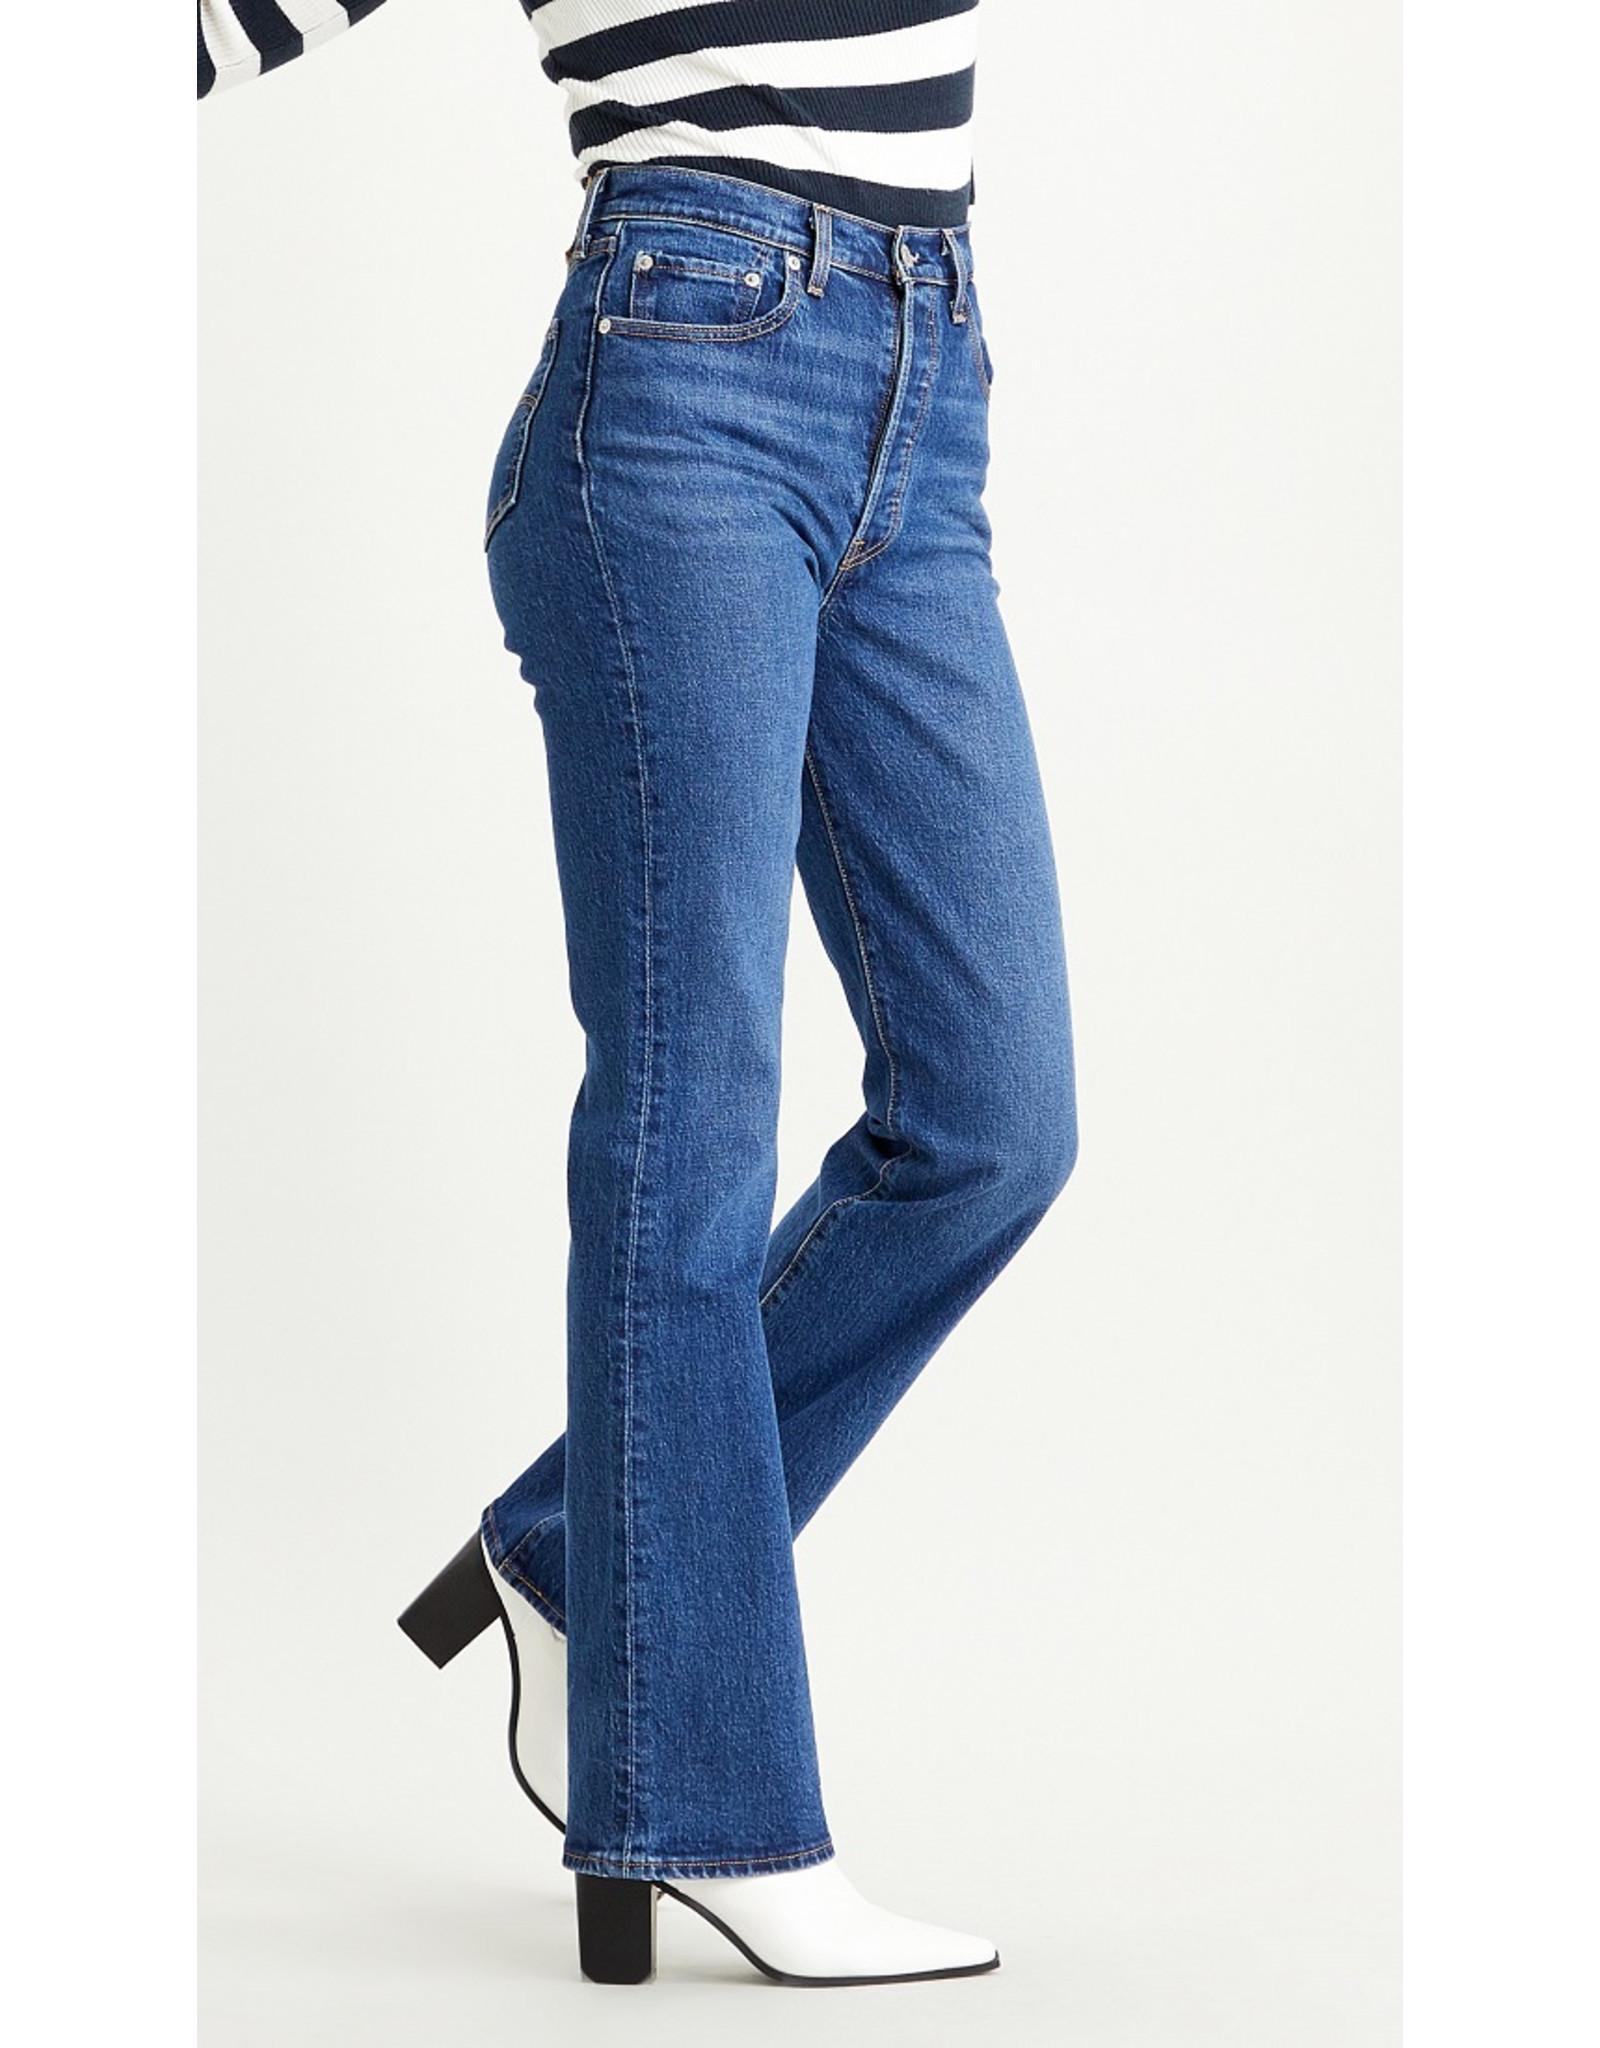 Levi's Levi's Jeans, Ribcage Boot